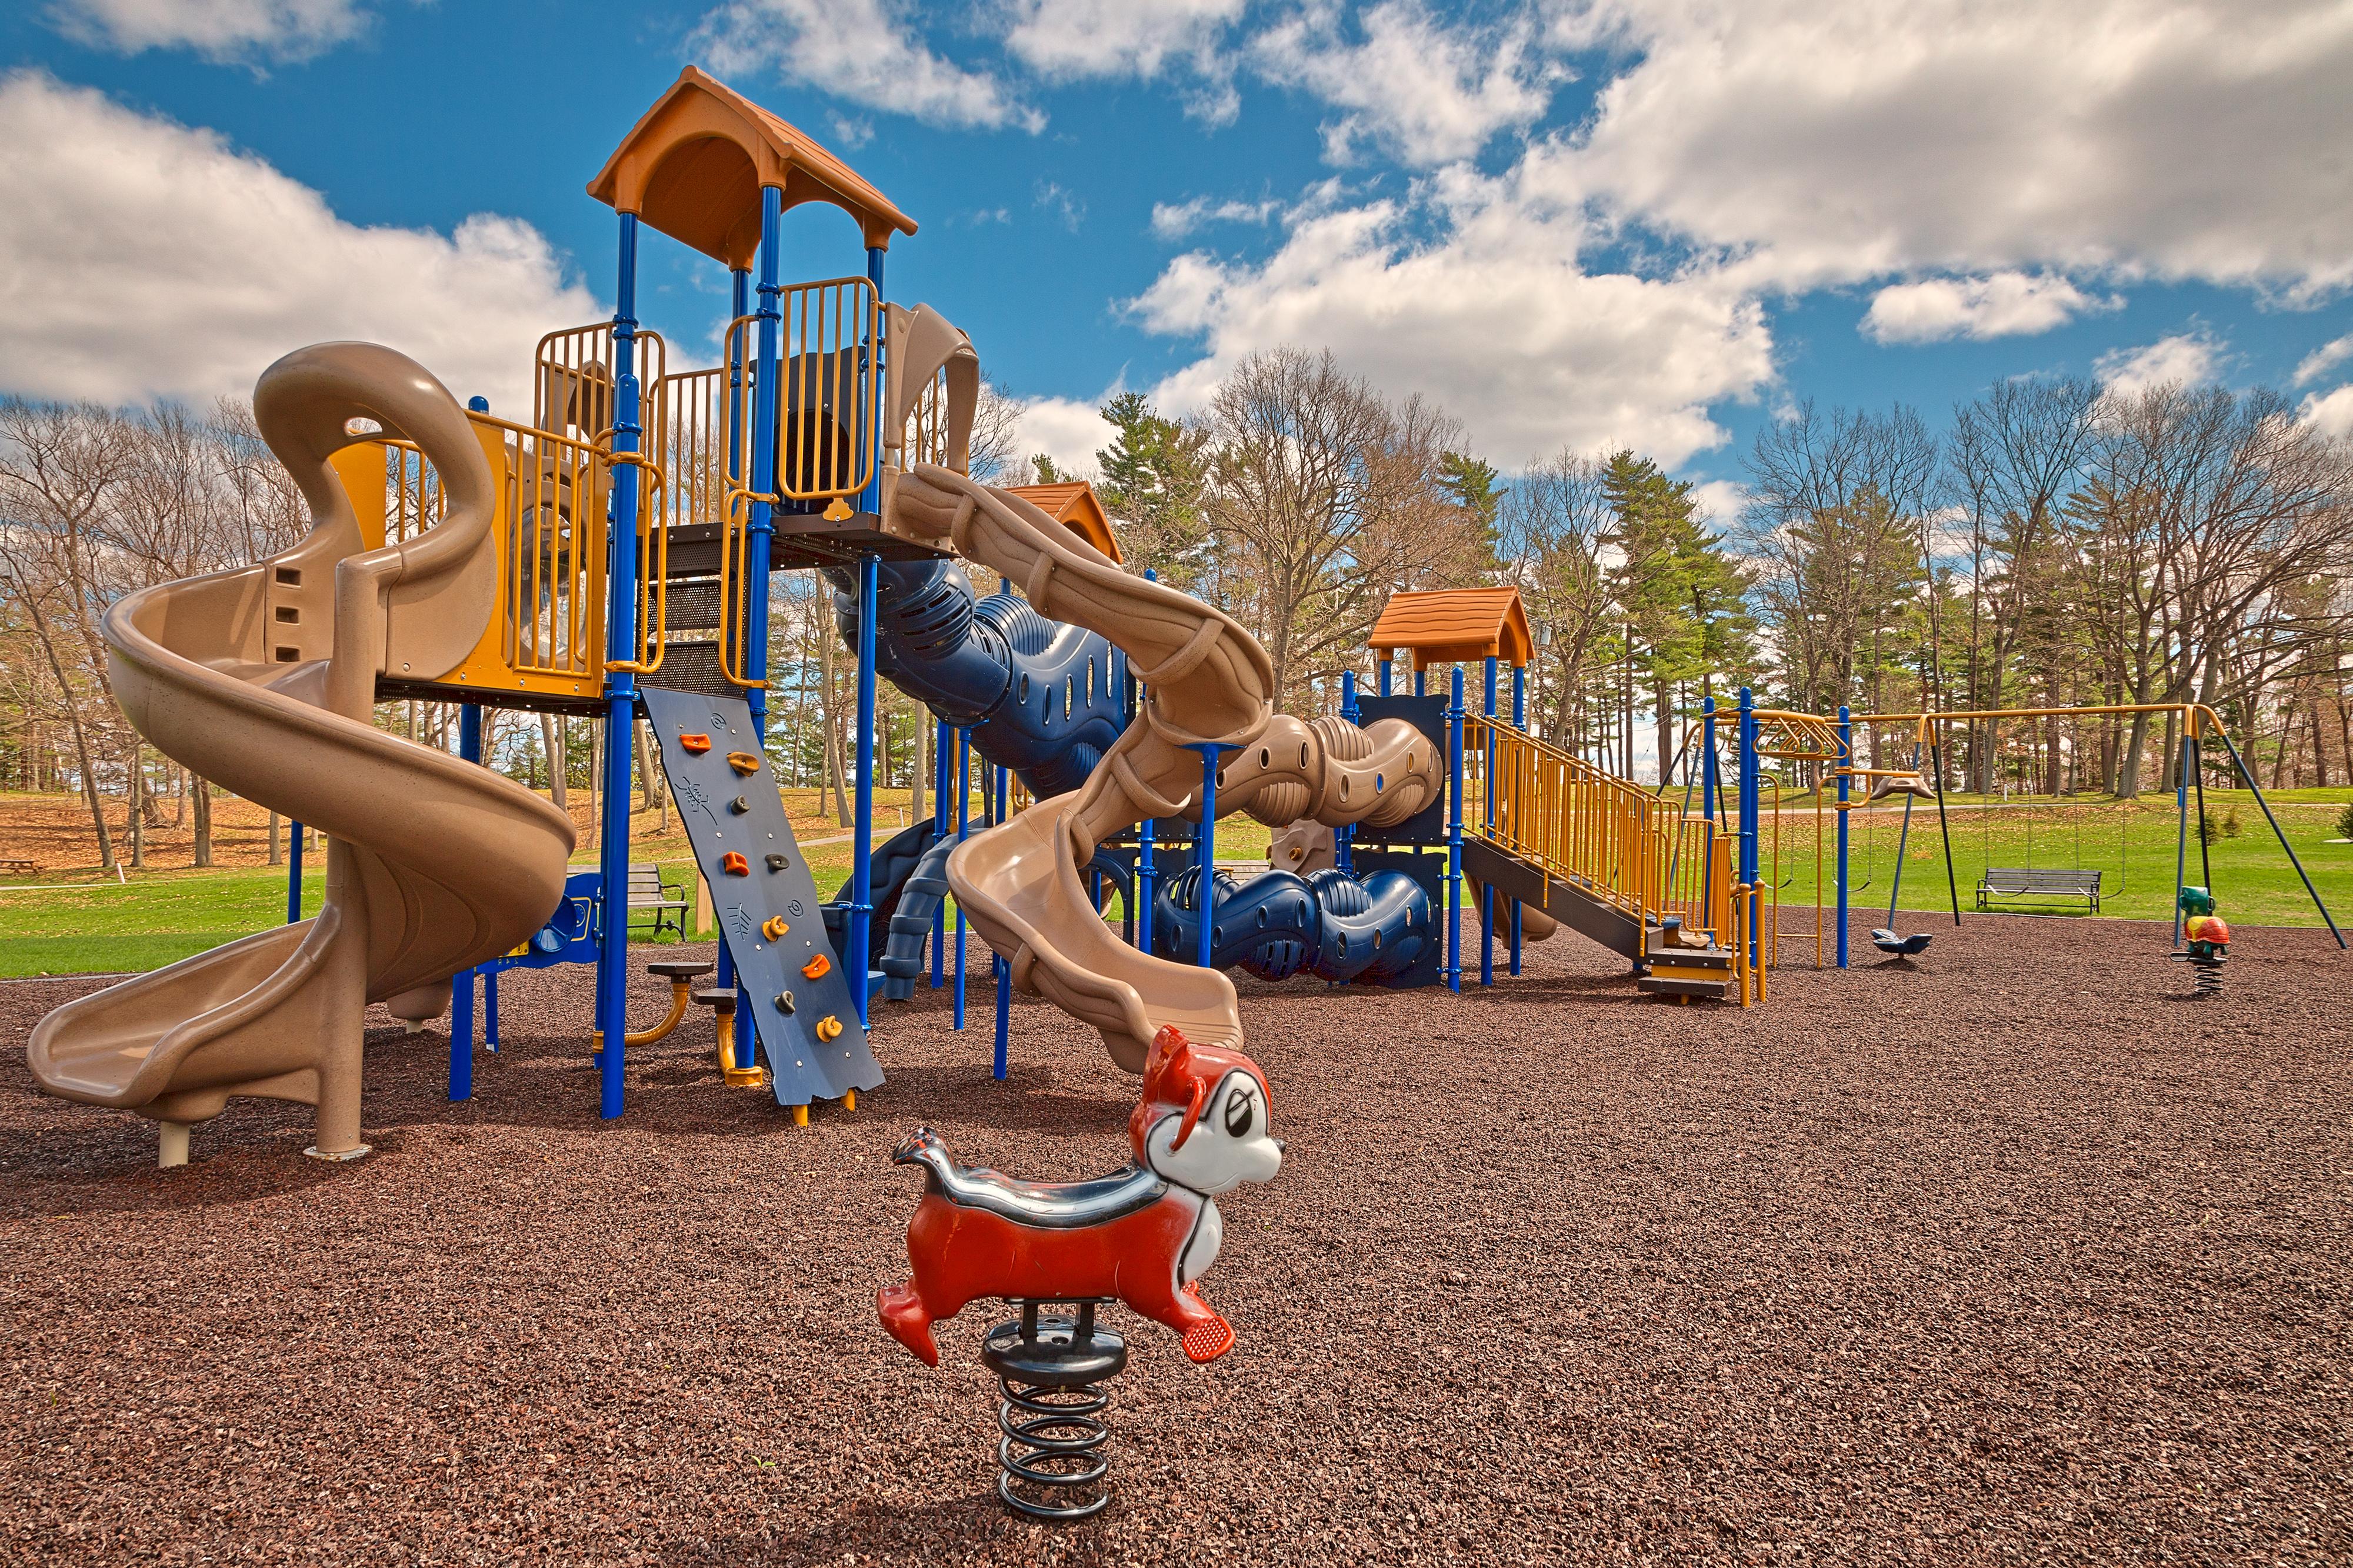 Wellesley Island Playground (freebie) by boldfrontiers